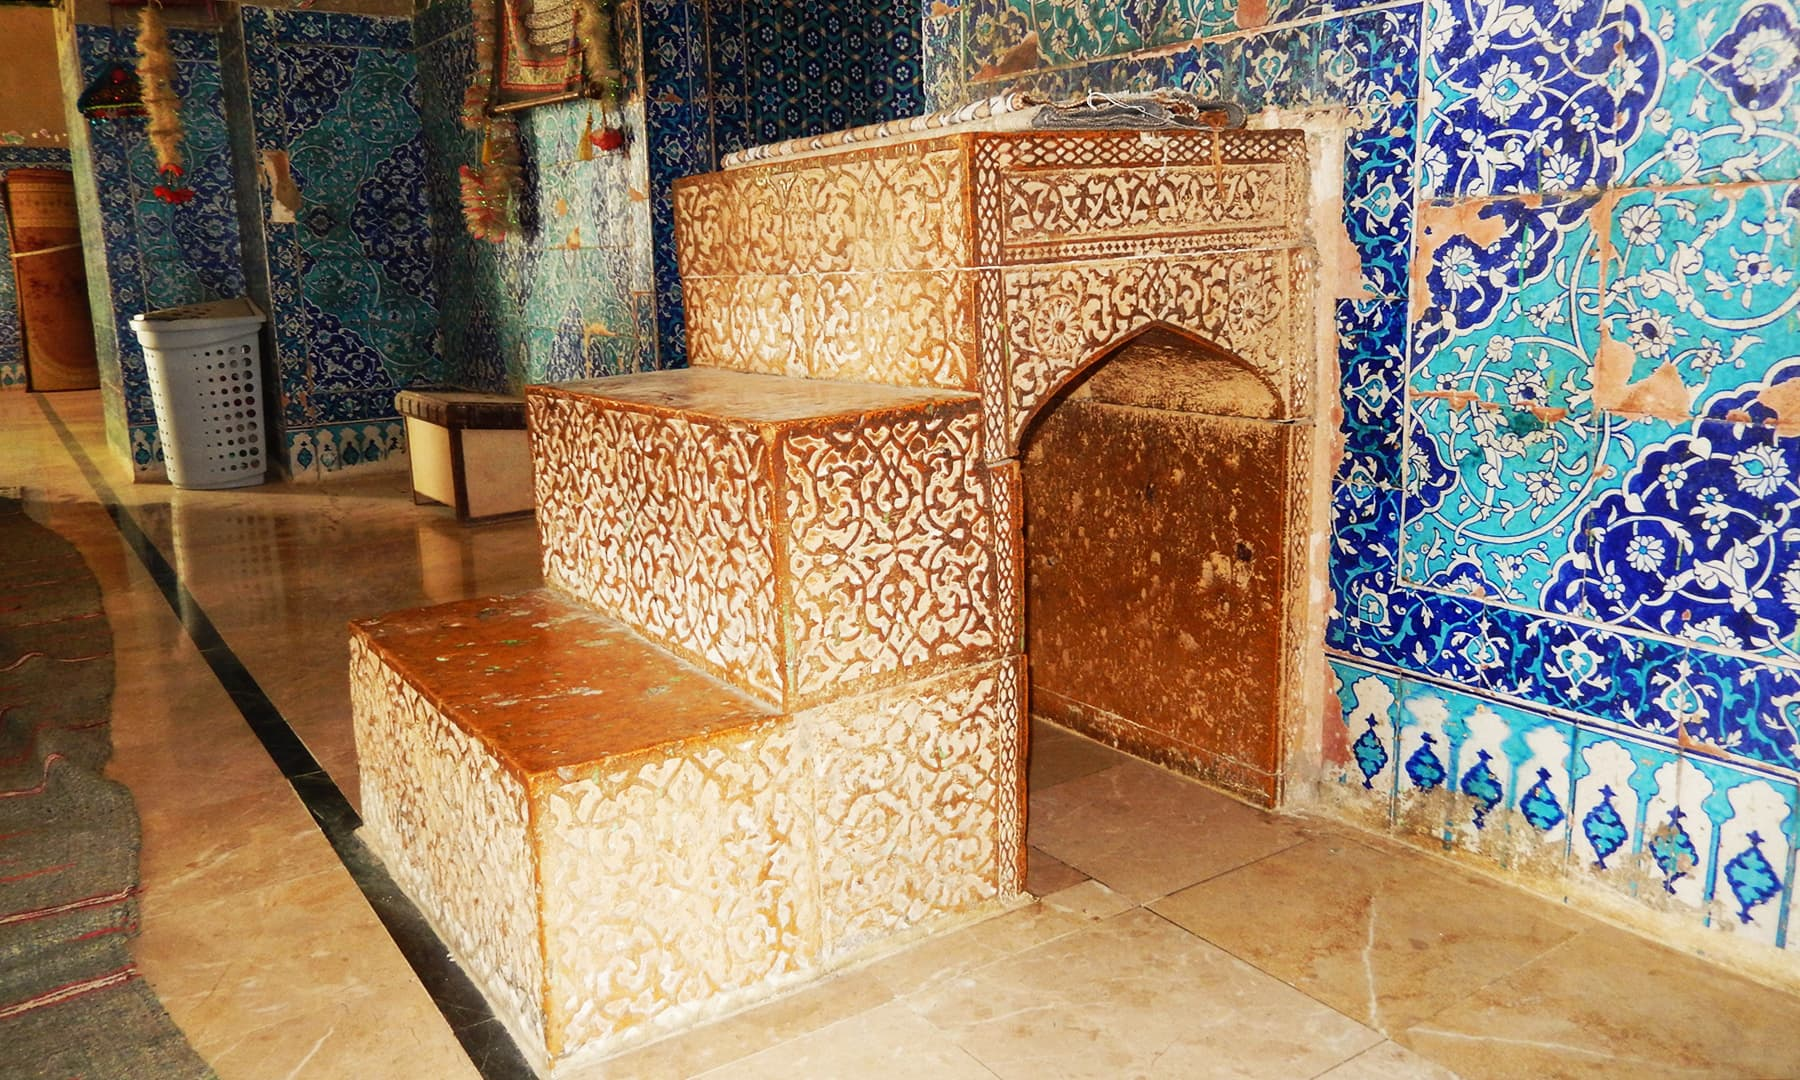 مزار کی مسجد کا قدیم منبر — تصویر ابوبکر شیخ